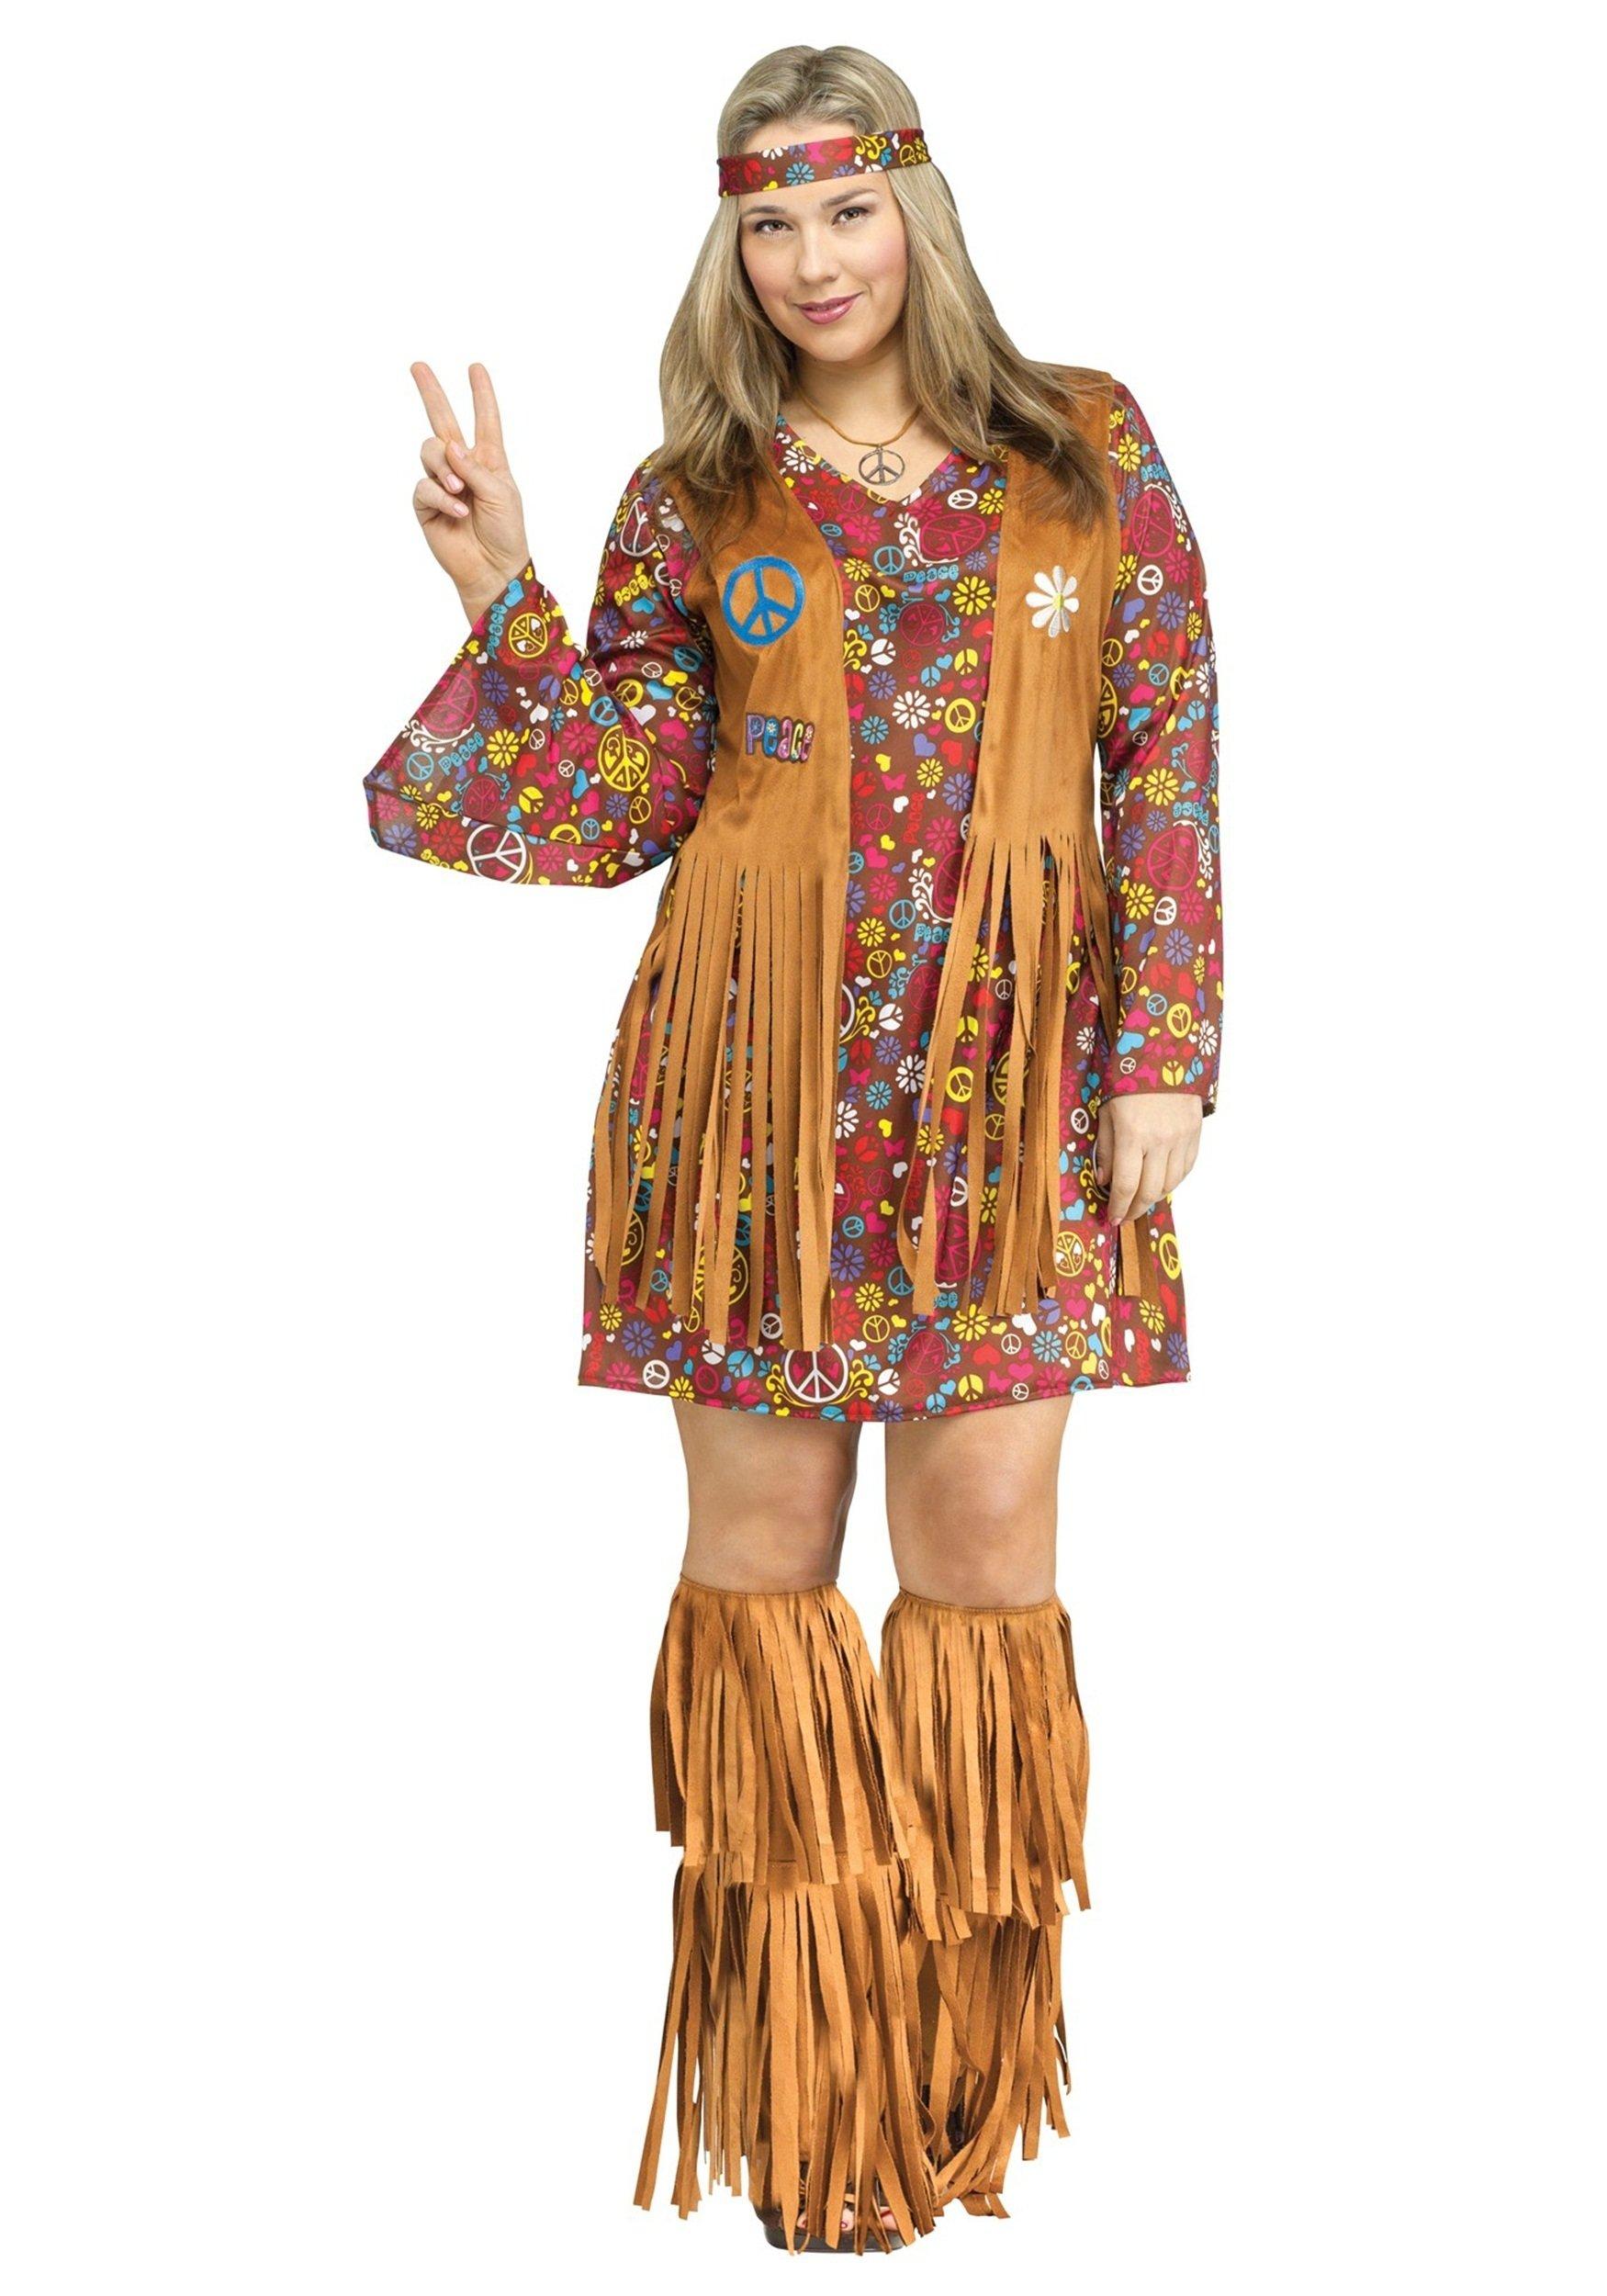 10 Cute Plus Size Halloween Costumes Ideas peace love plus size costume 2020